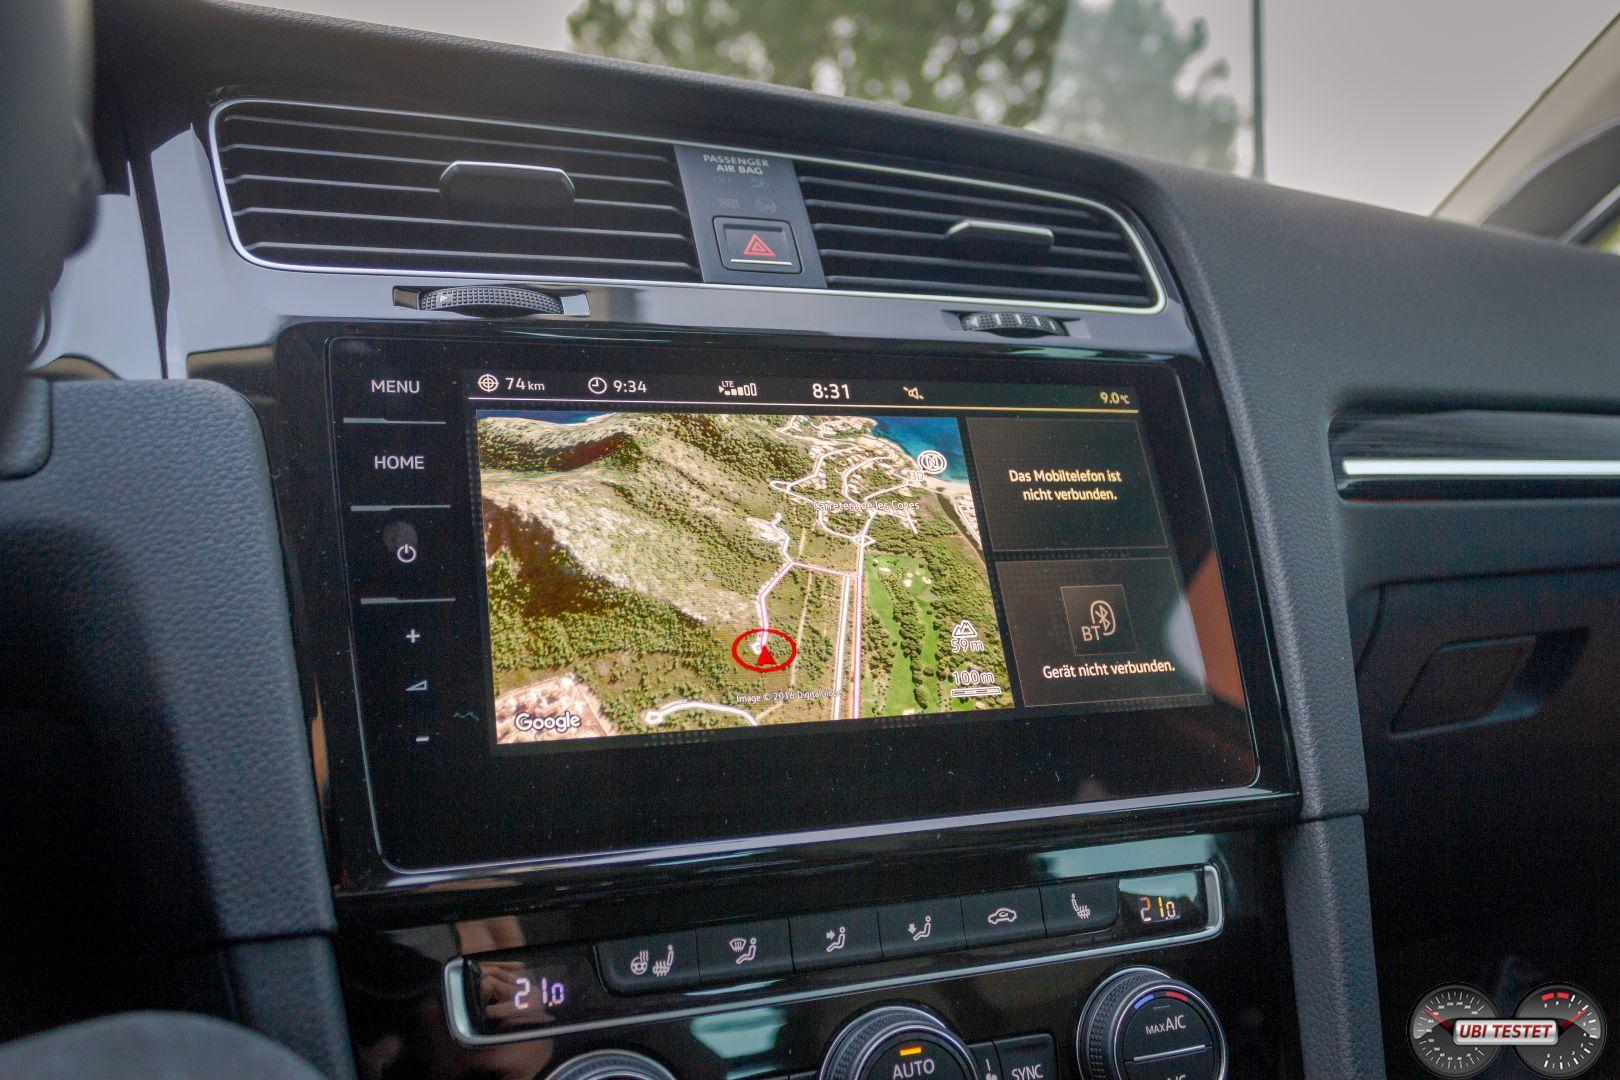 VW Golf Discover Pro 2017-2 — Ubi Testet